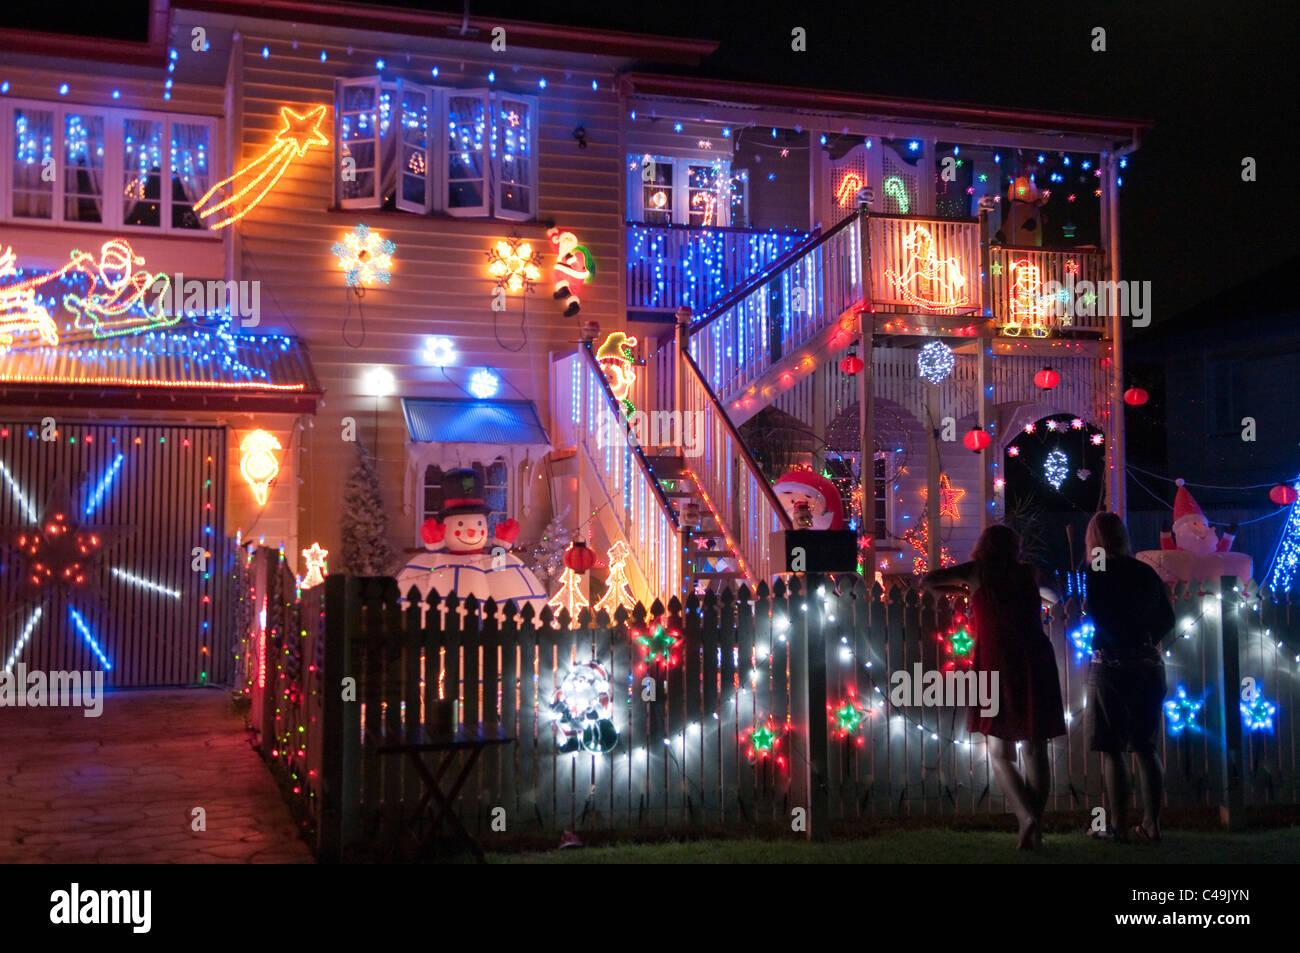 Christmas Lights Decorating A House Brisbane Queensland Australia Stock Photo Alamy